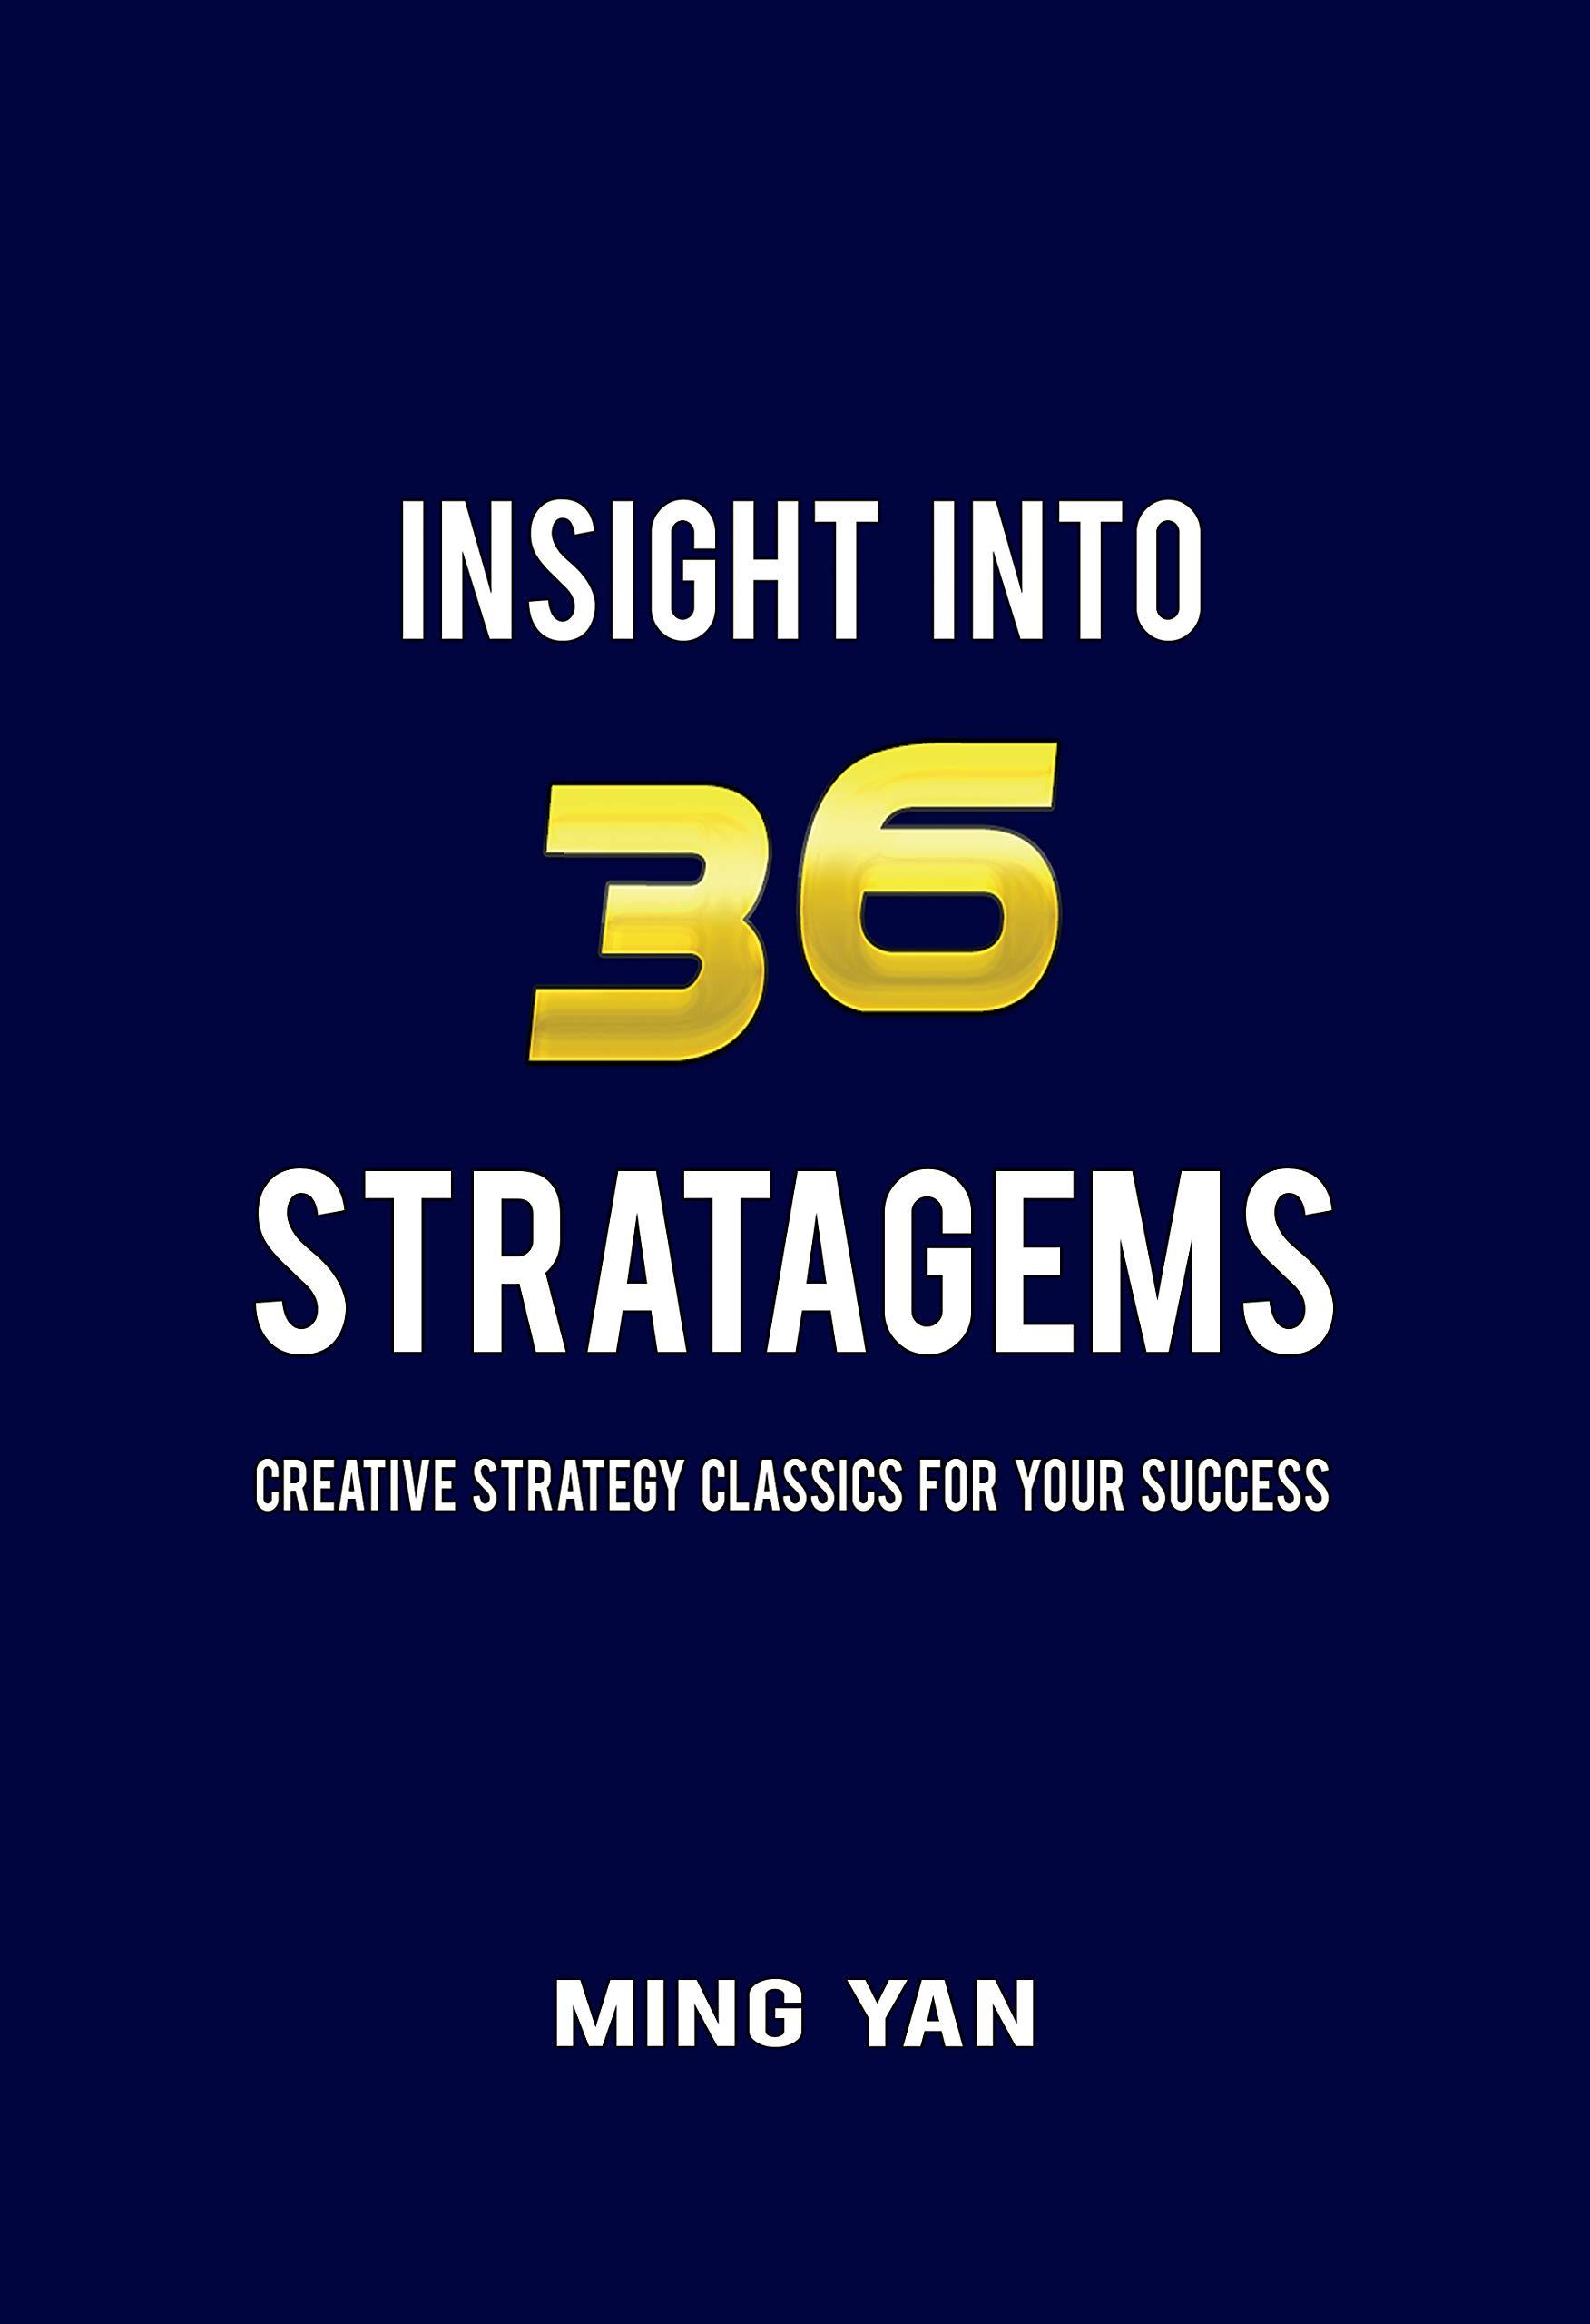 Insight Into 36 Stratagems